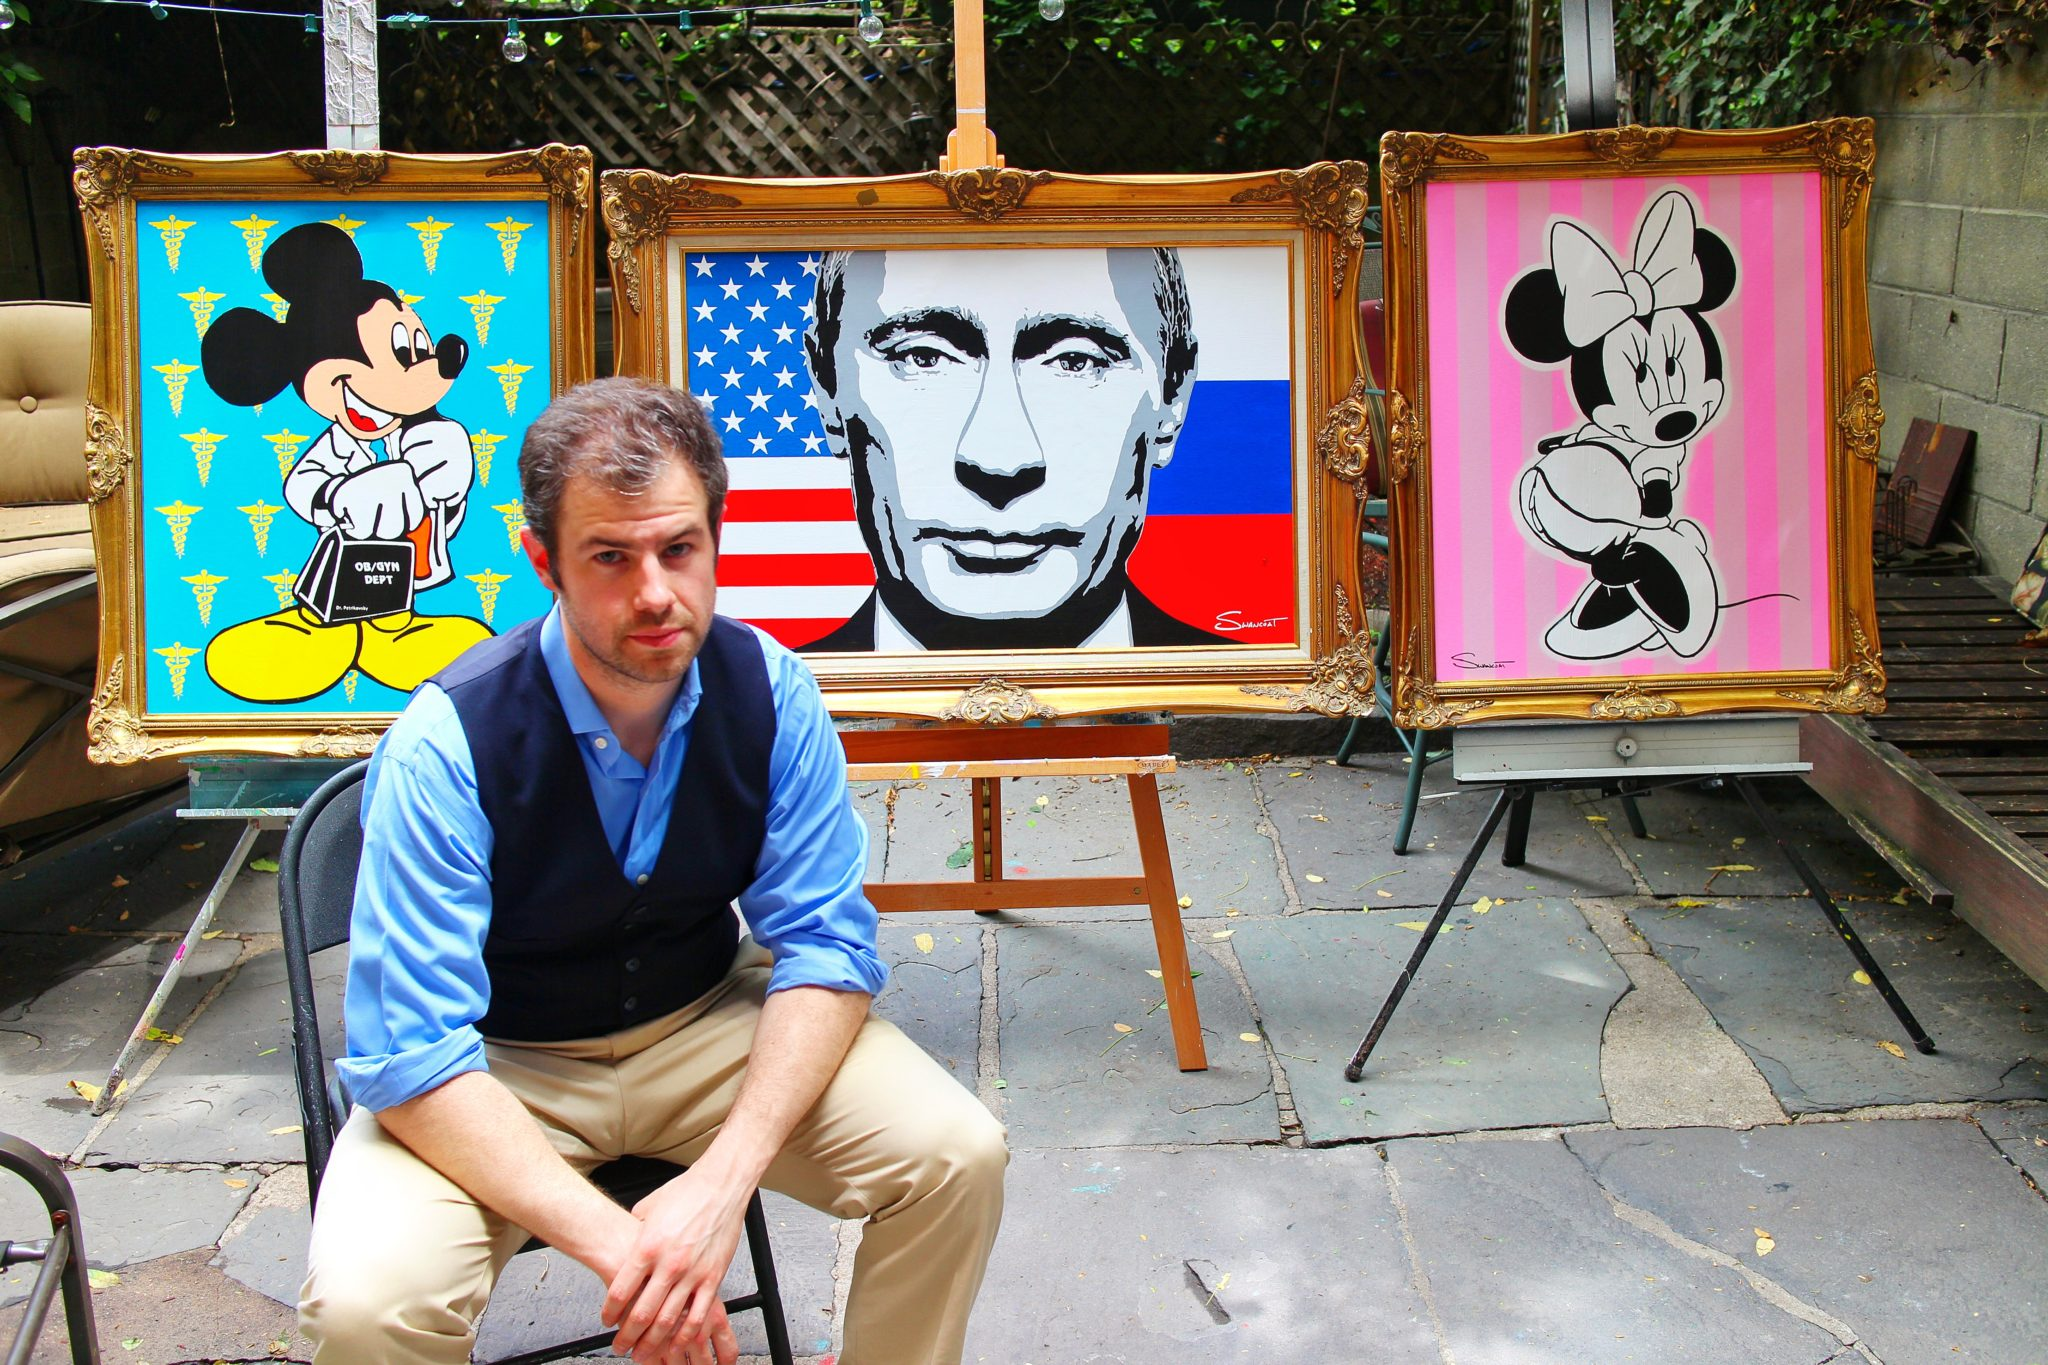 Steven Swancoat Discusses Vladimir Putin Collection: Lab Talk